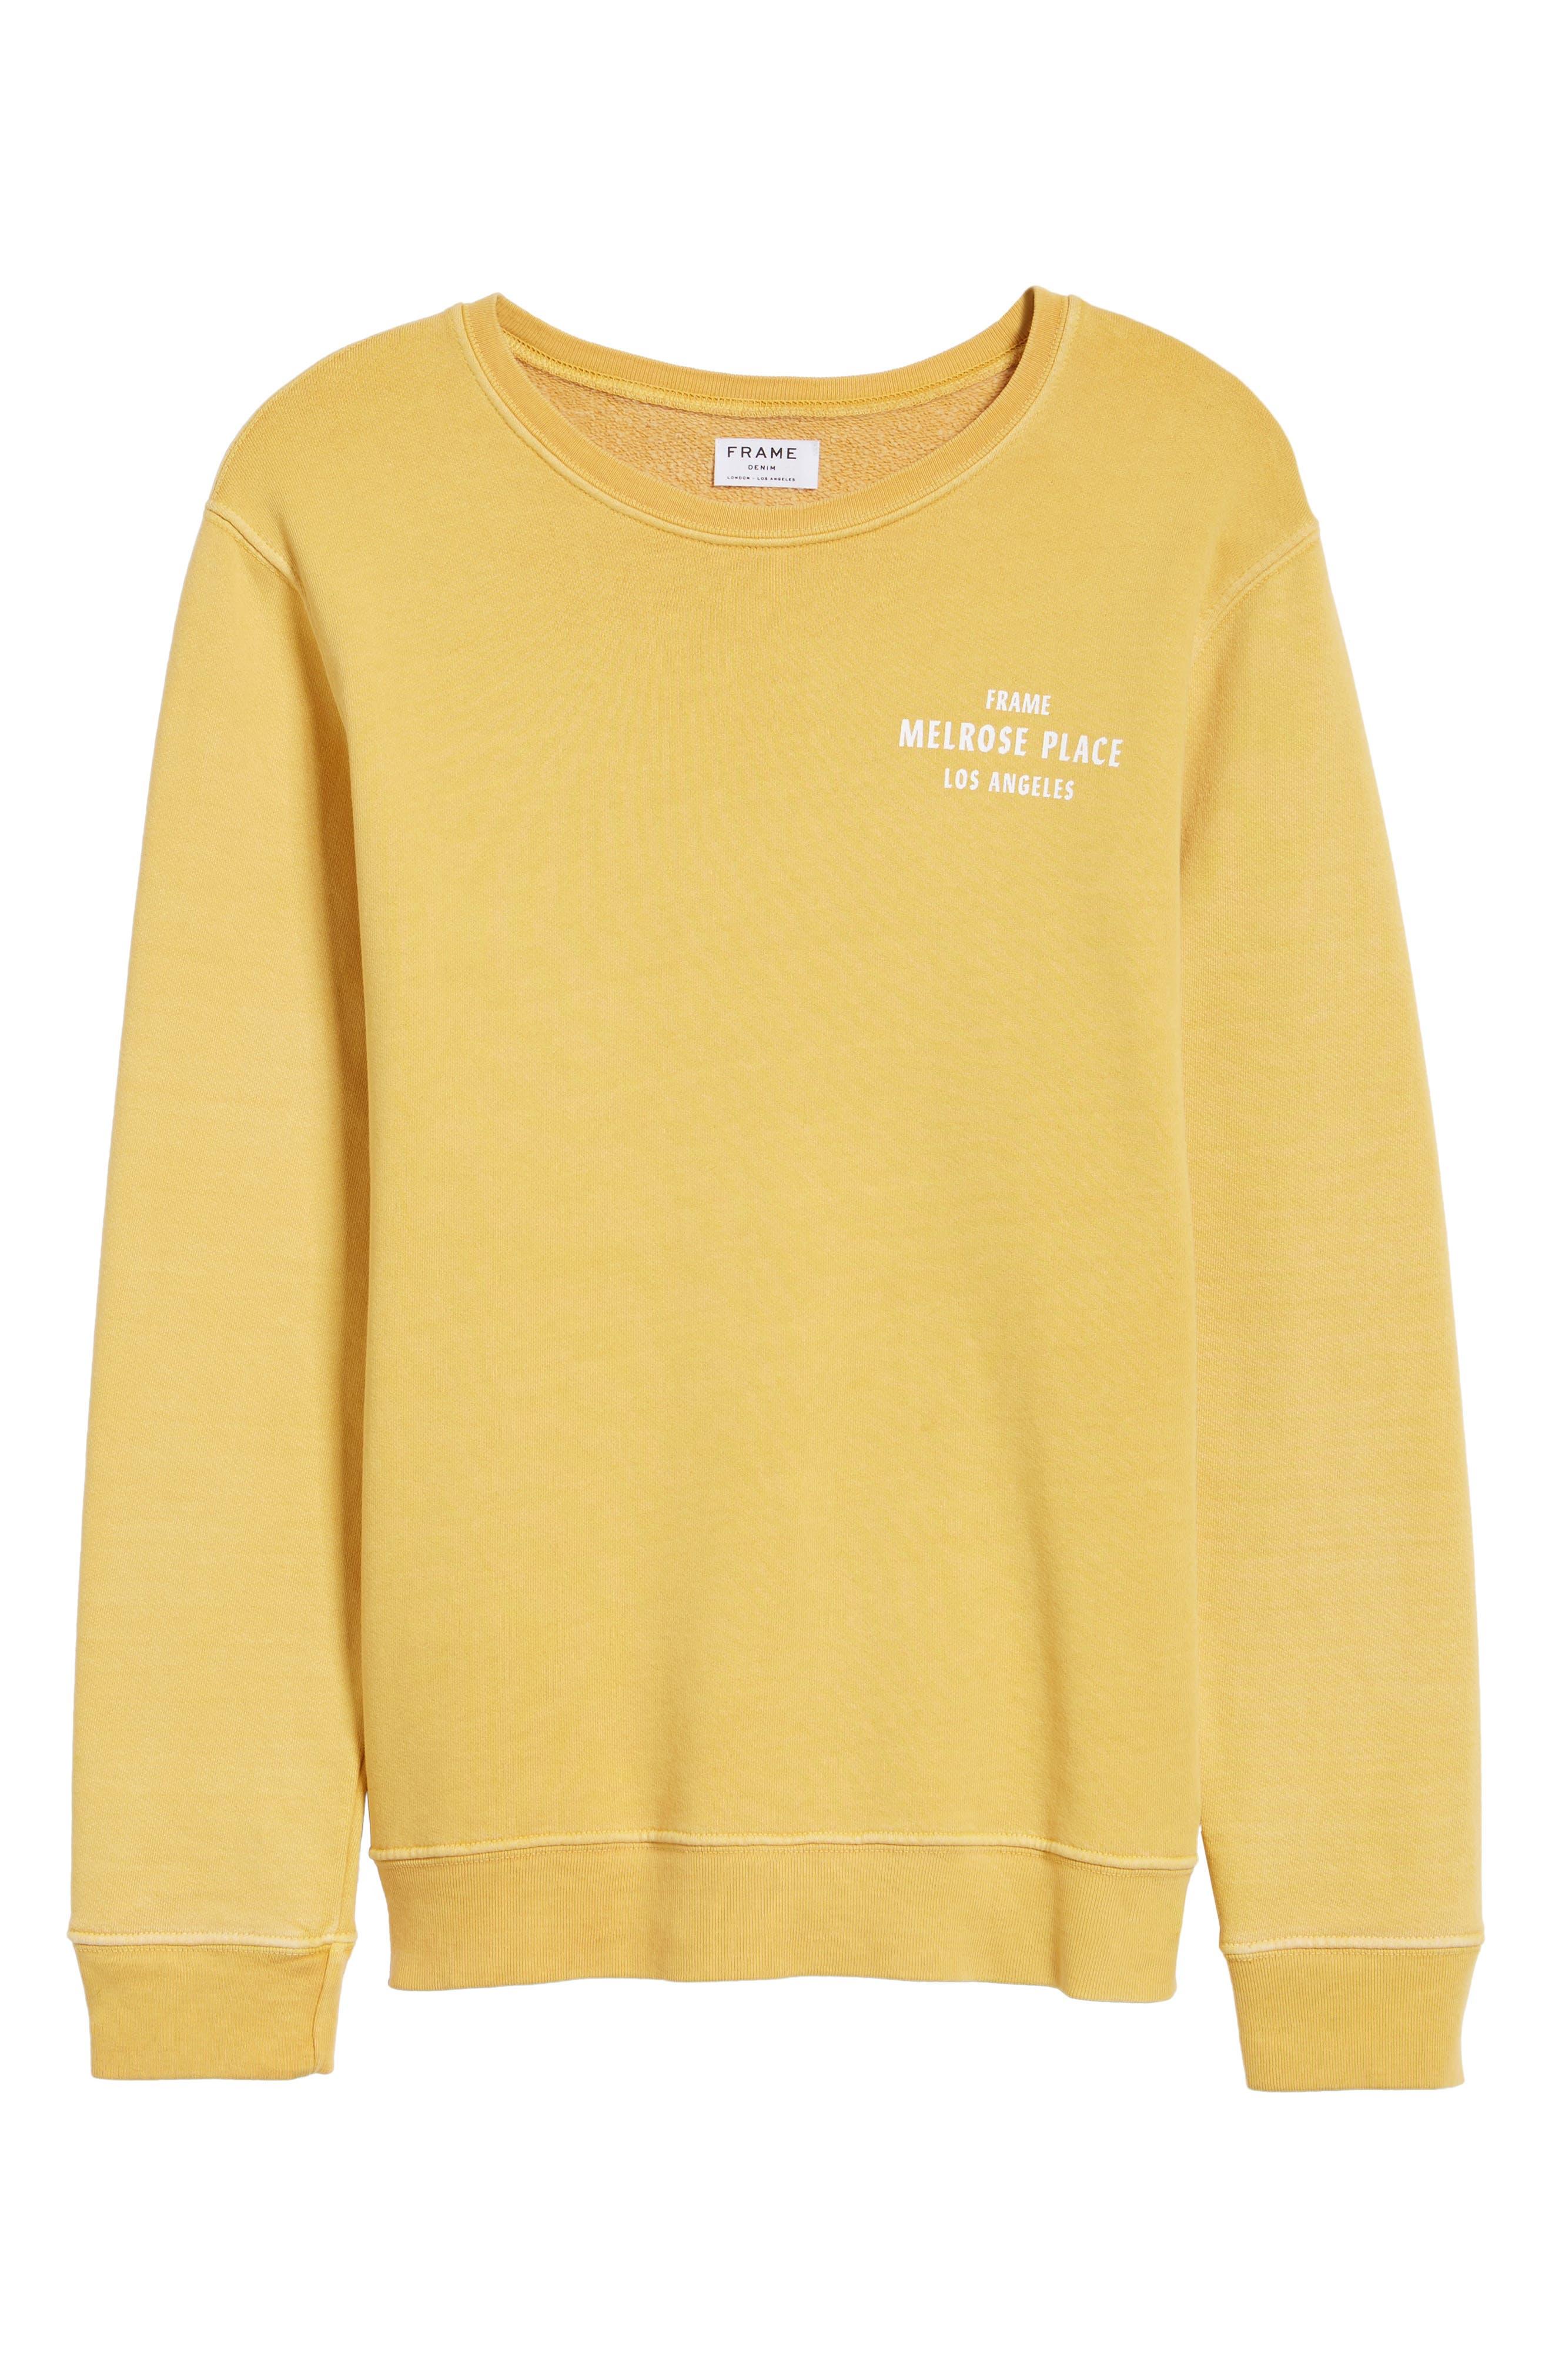 Vintage Crewneck Sweatshirt,                             Alternate thumbnail 18, color,